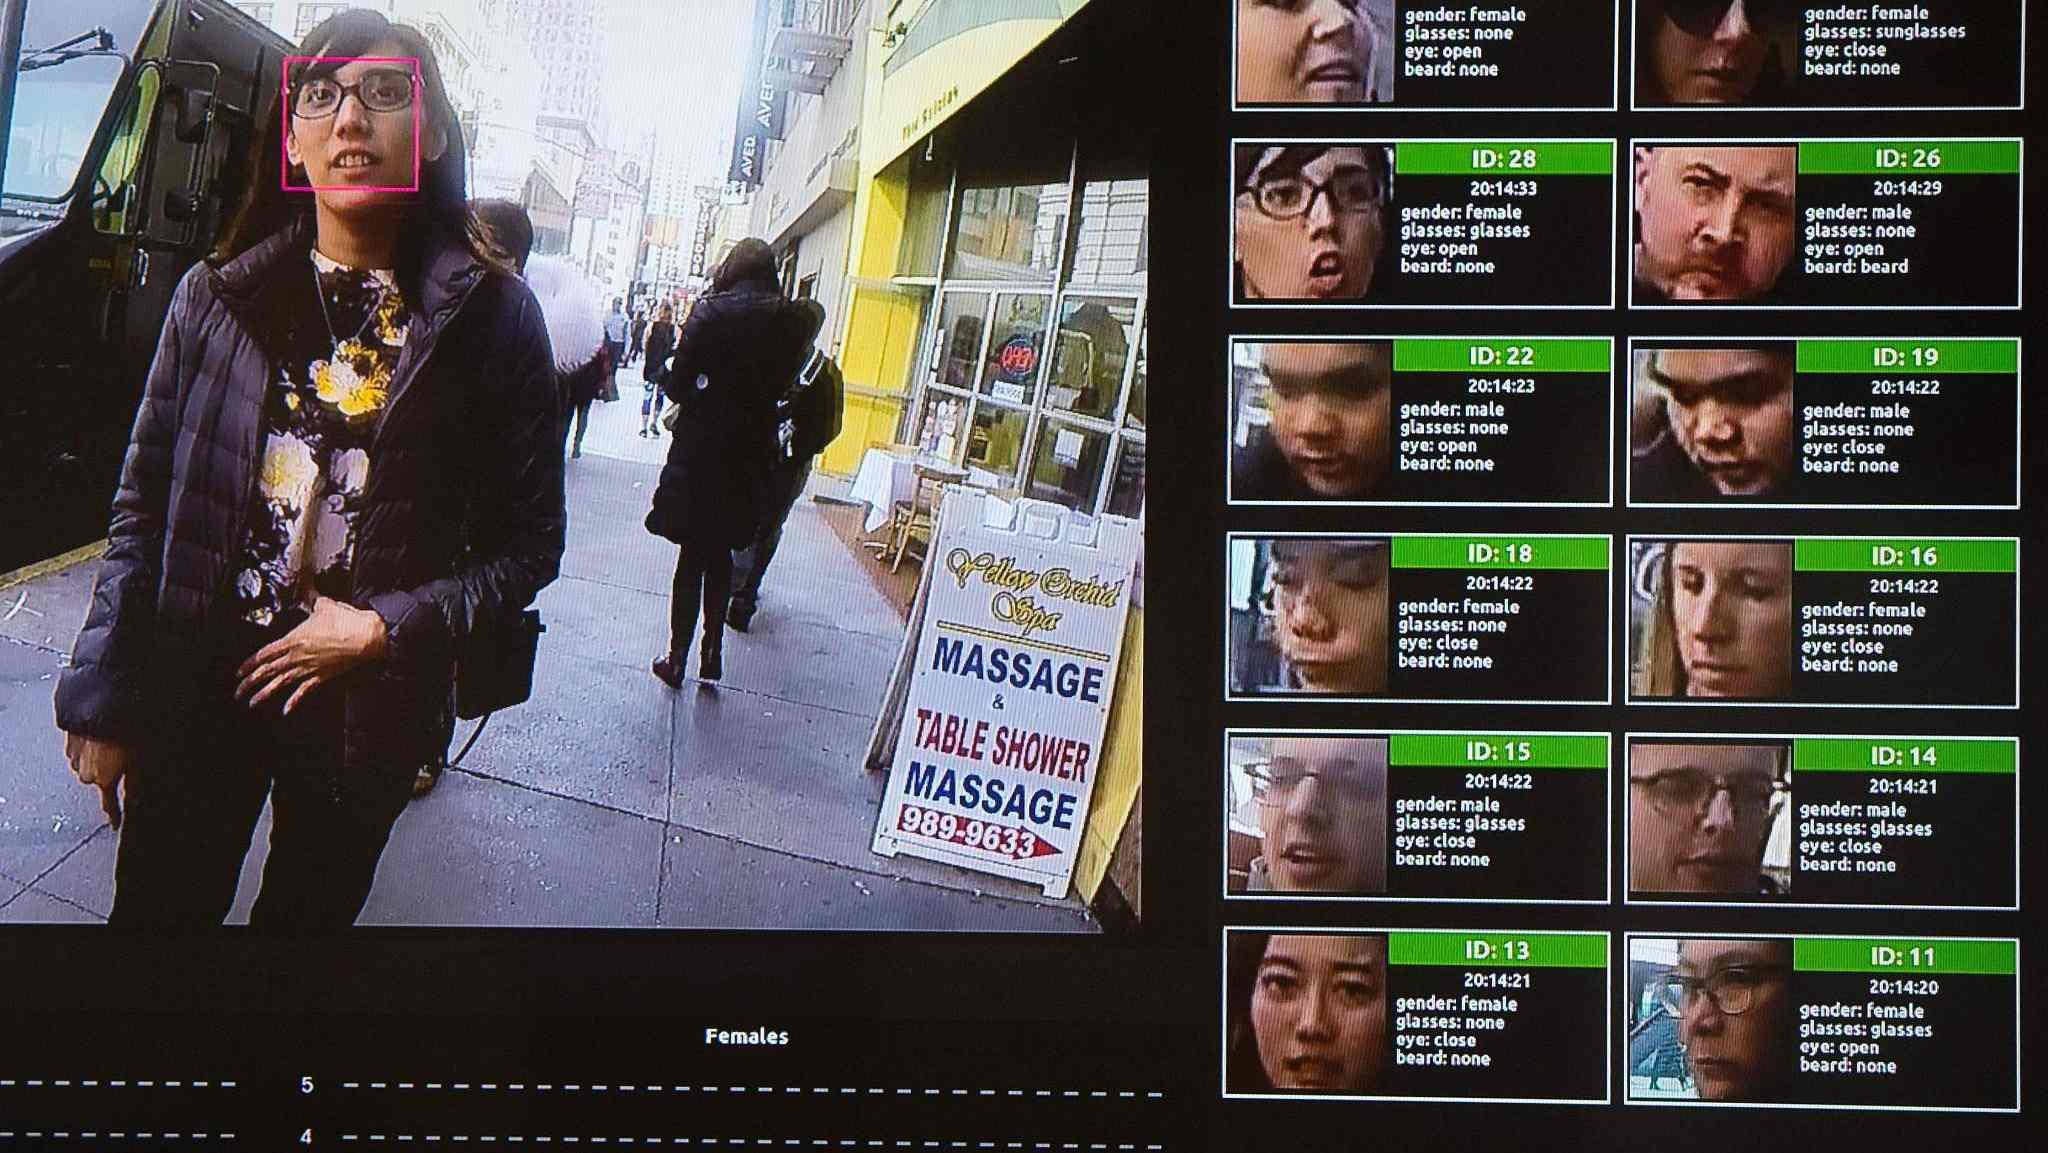 Microsoft raises alarms about facial recognition